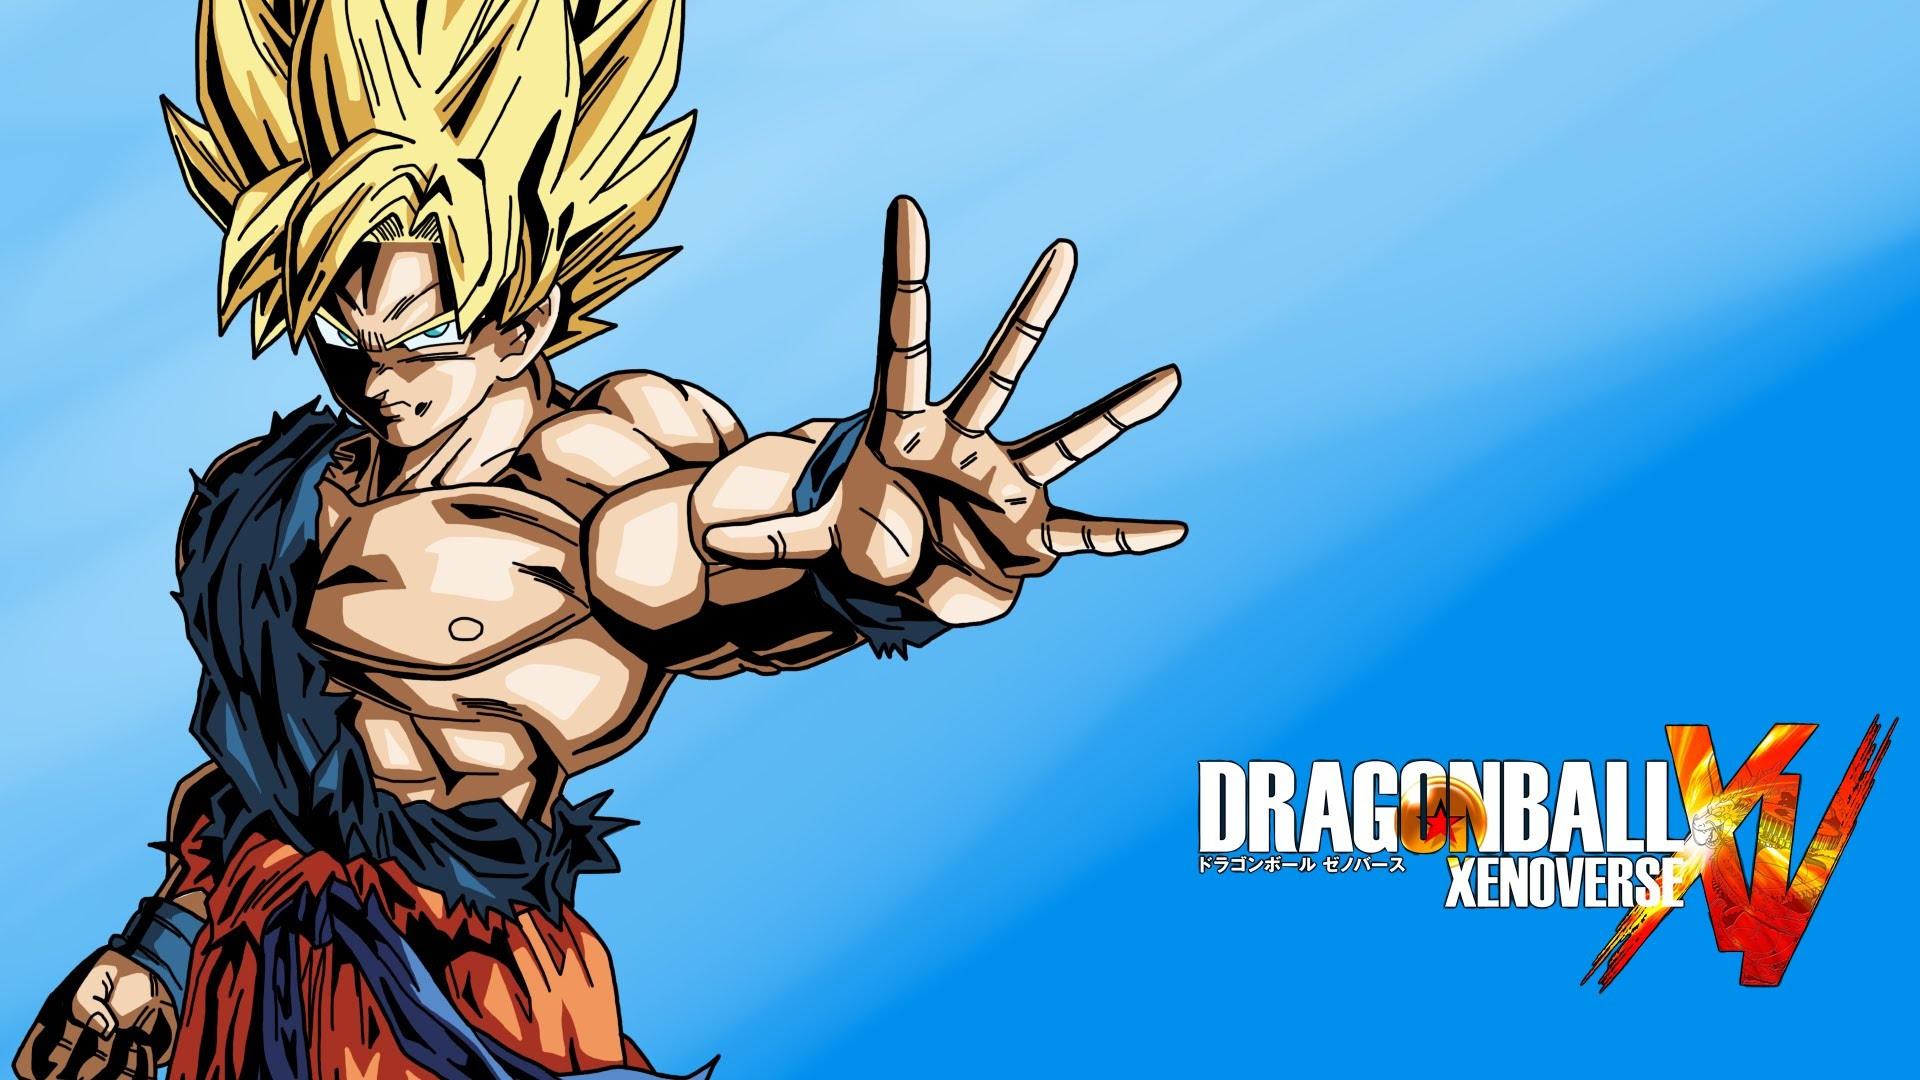 Goku Dragon Ball Z 4k Wallpaper Gambarku